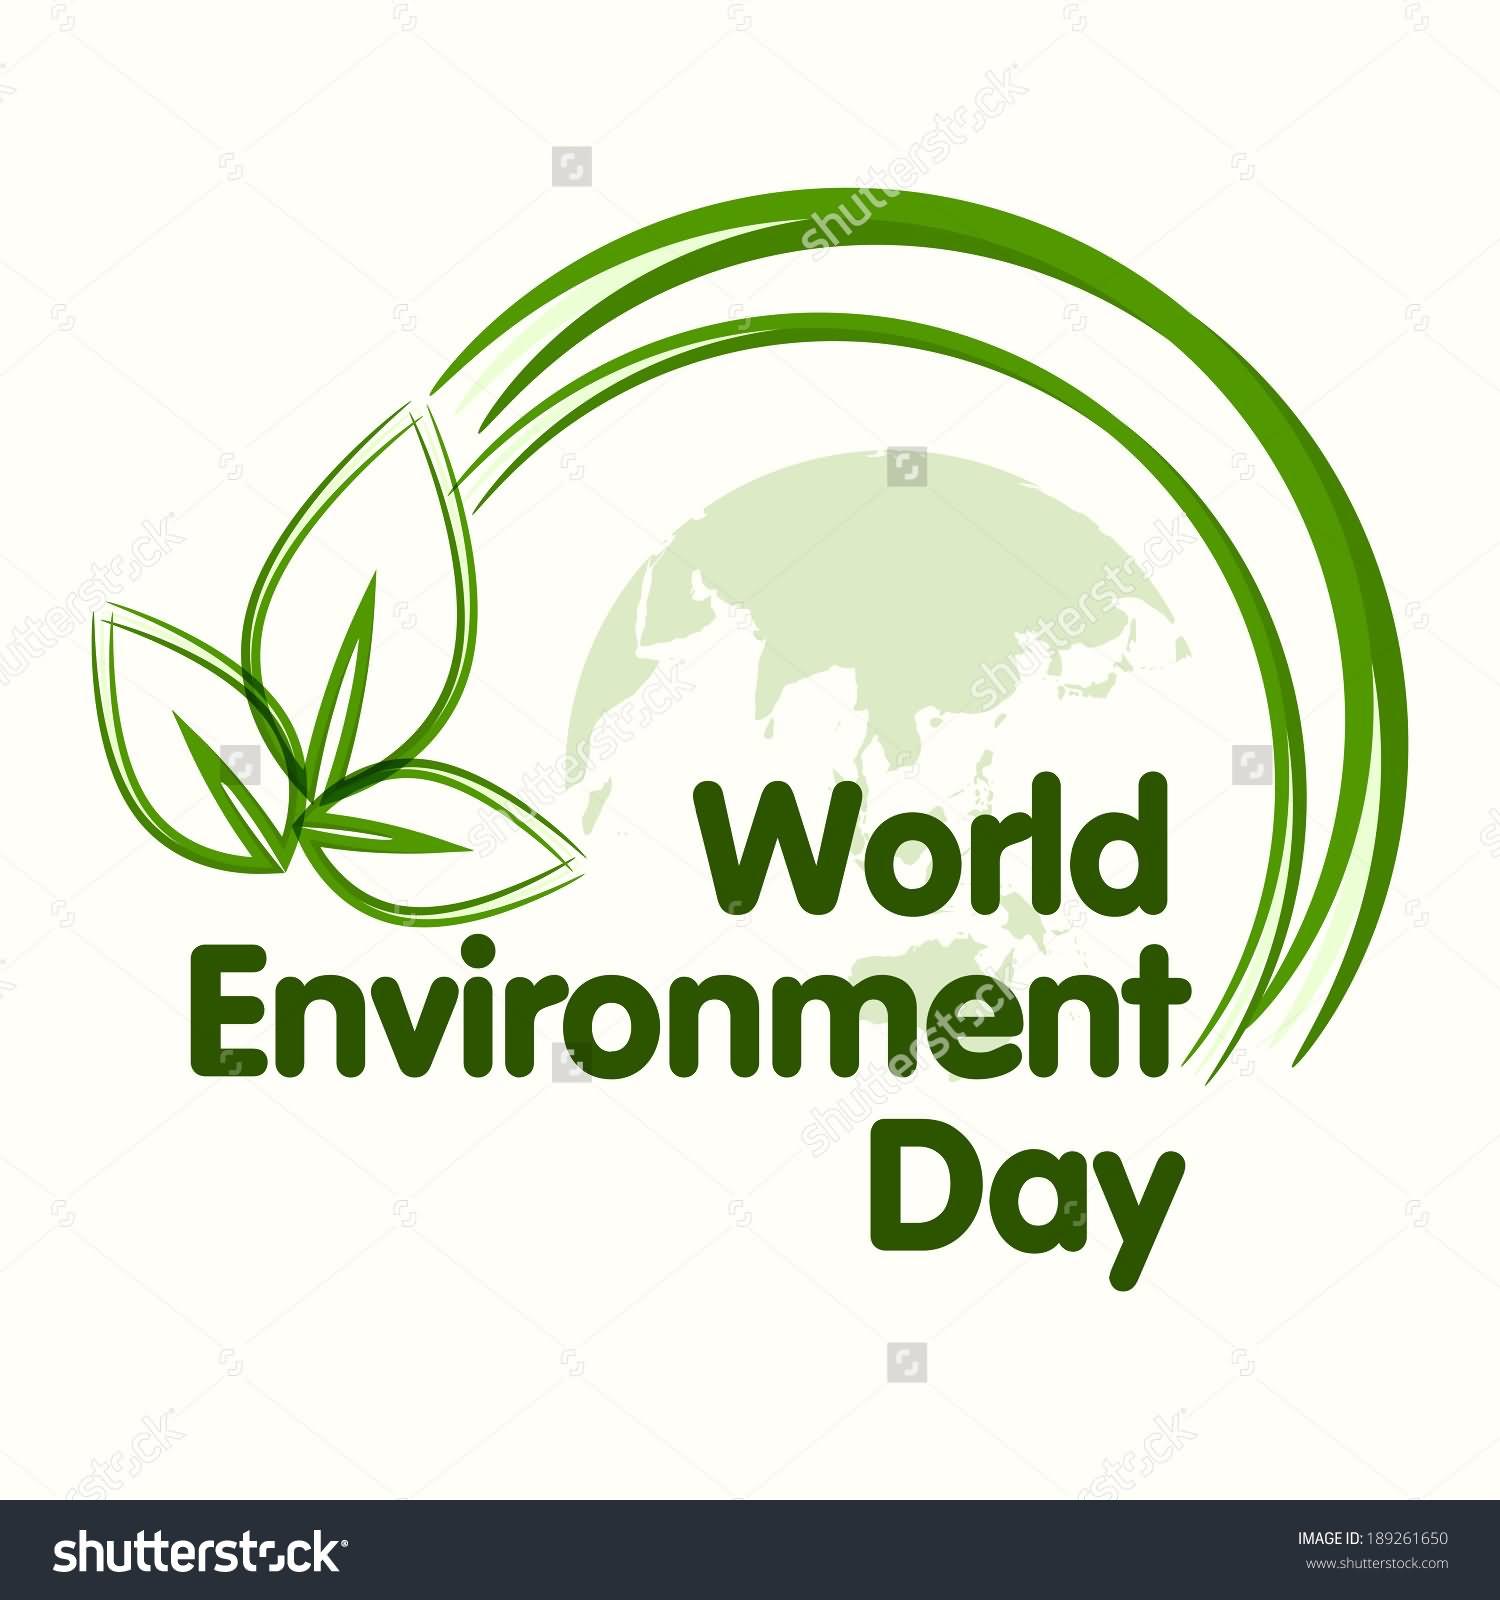 Environment clipart environment wallpaper.  most wonderful world